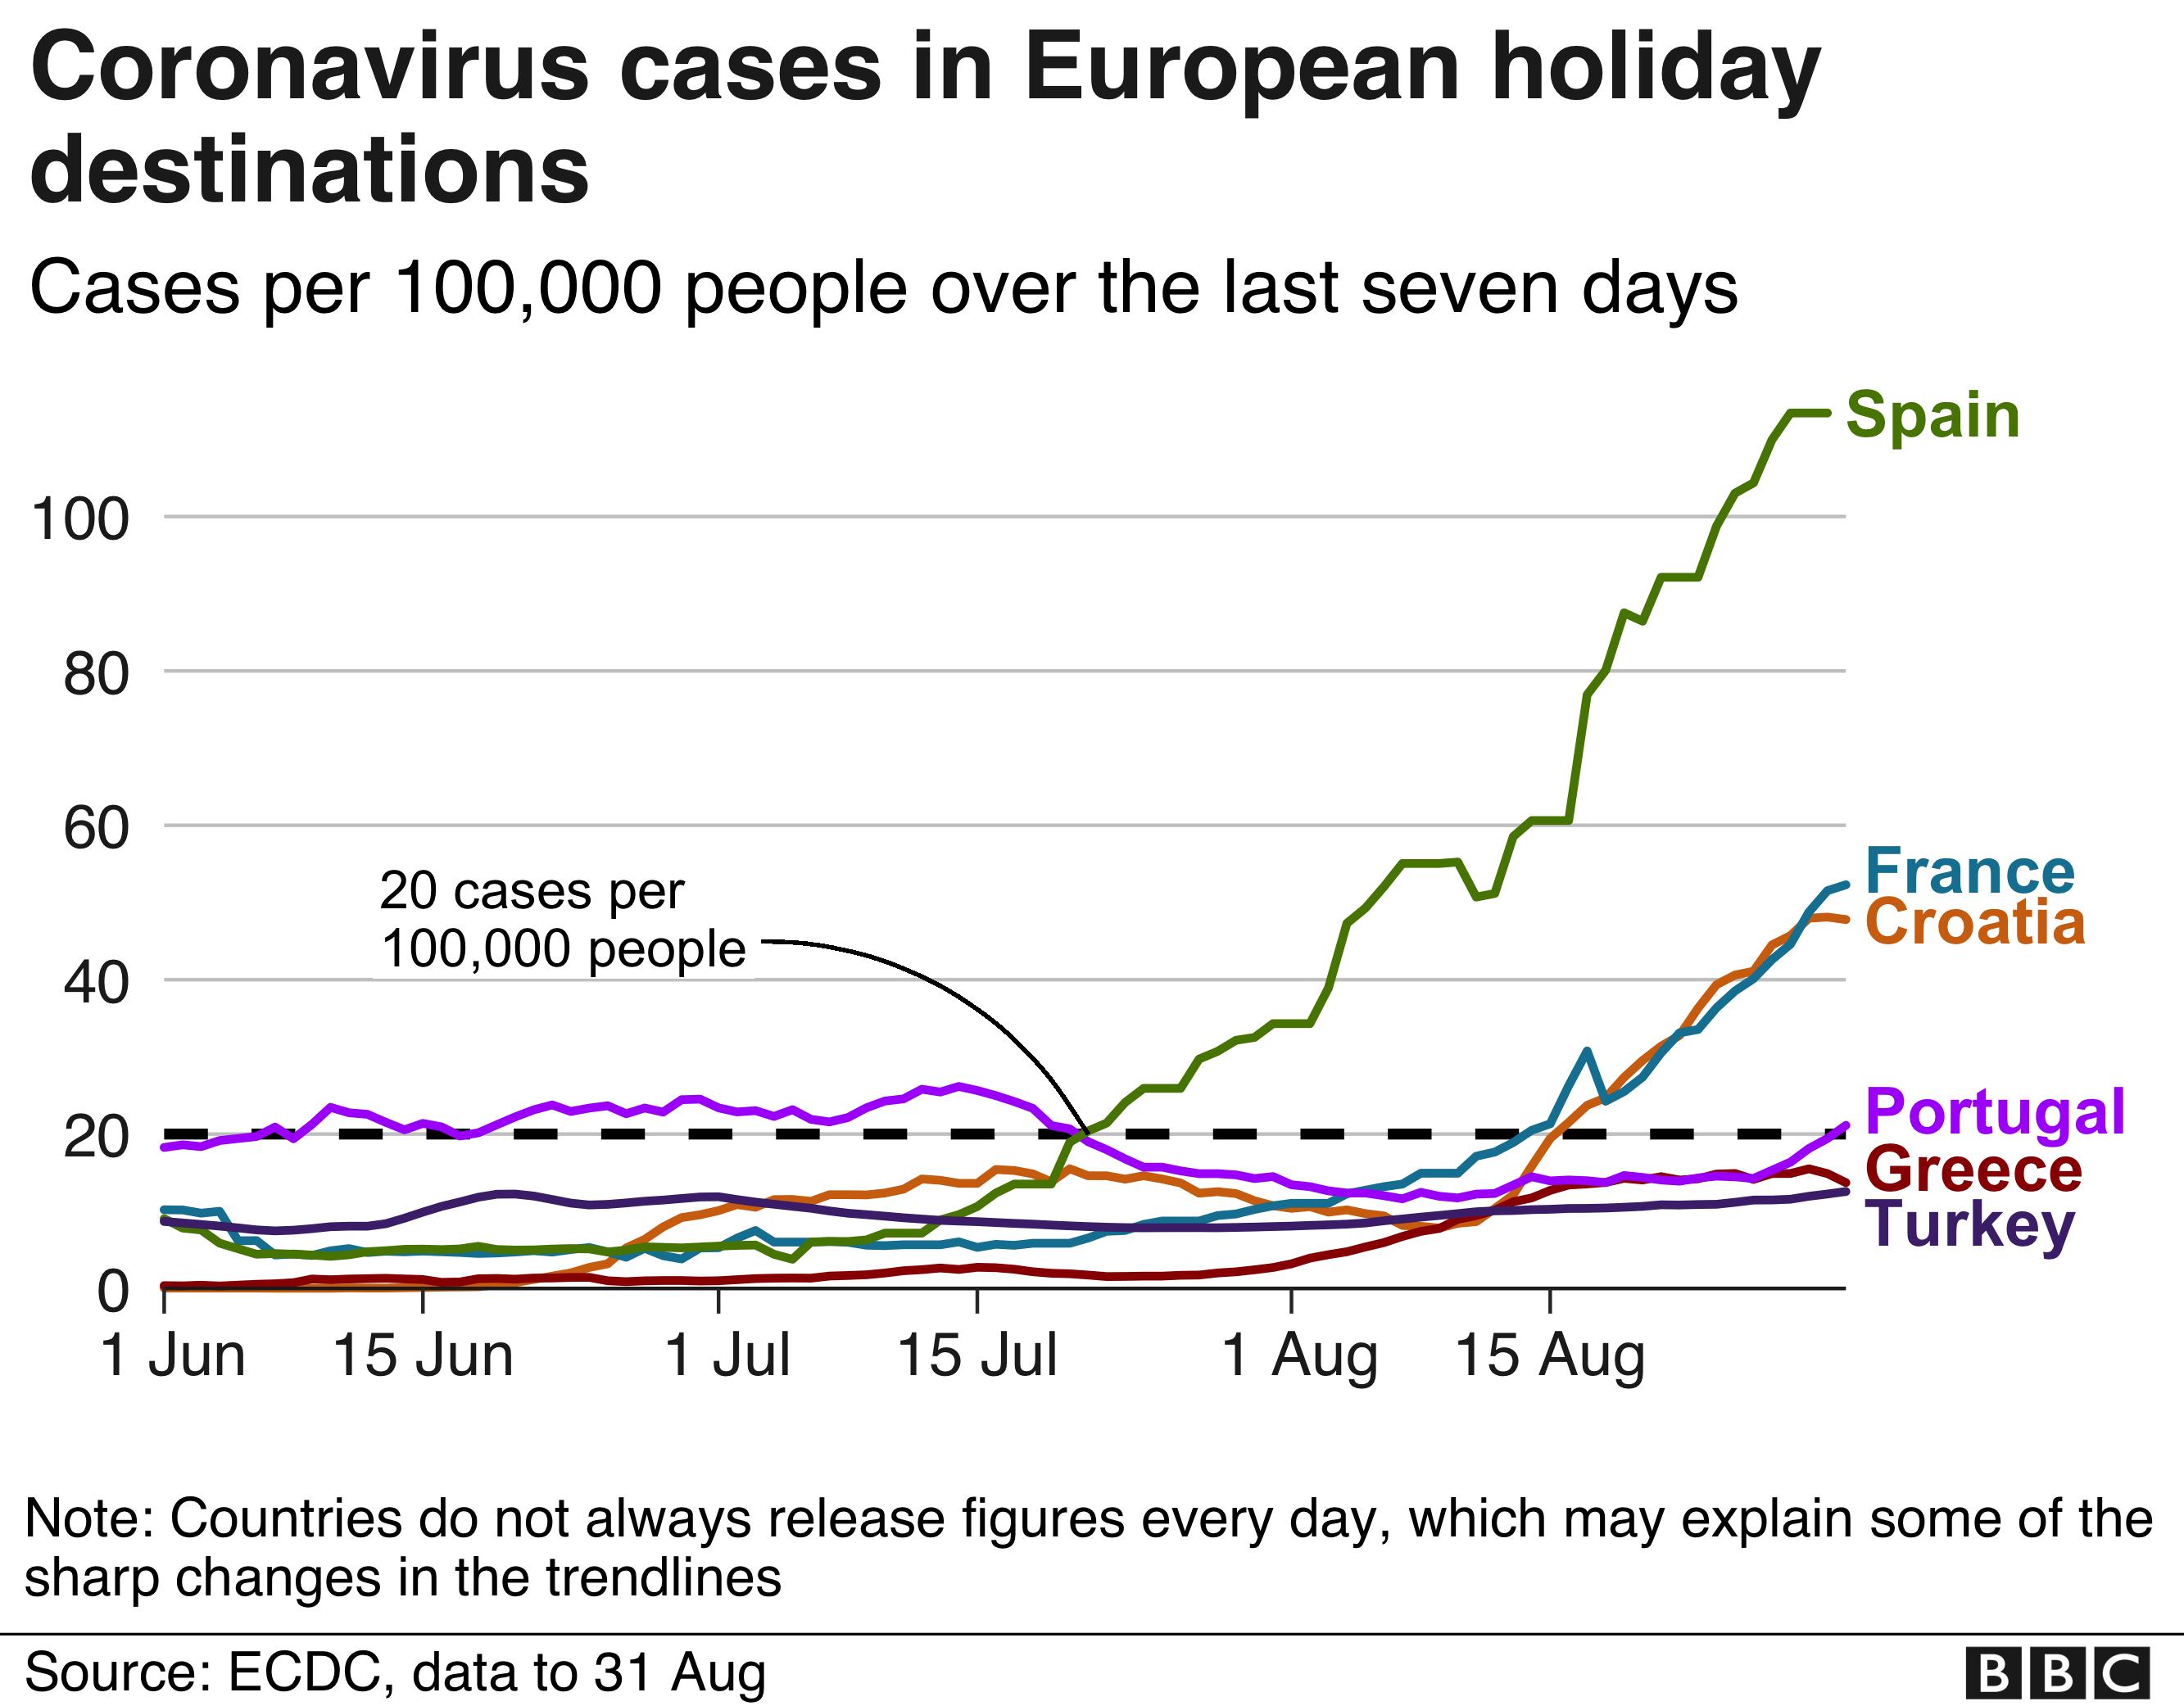 Chart showing coronavirus cases in major European holiday destinations